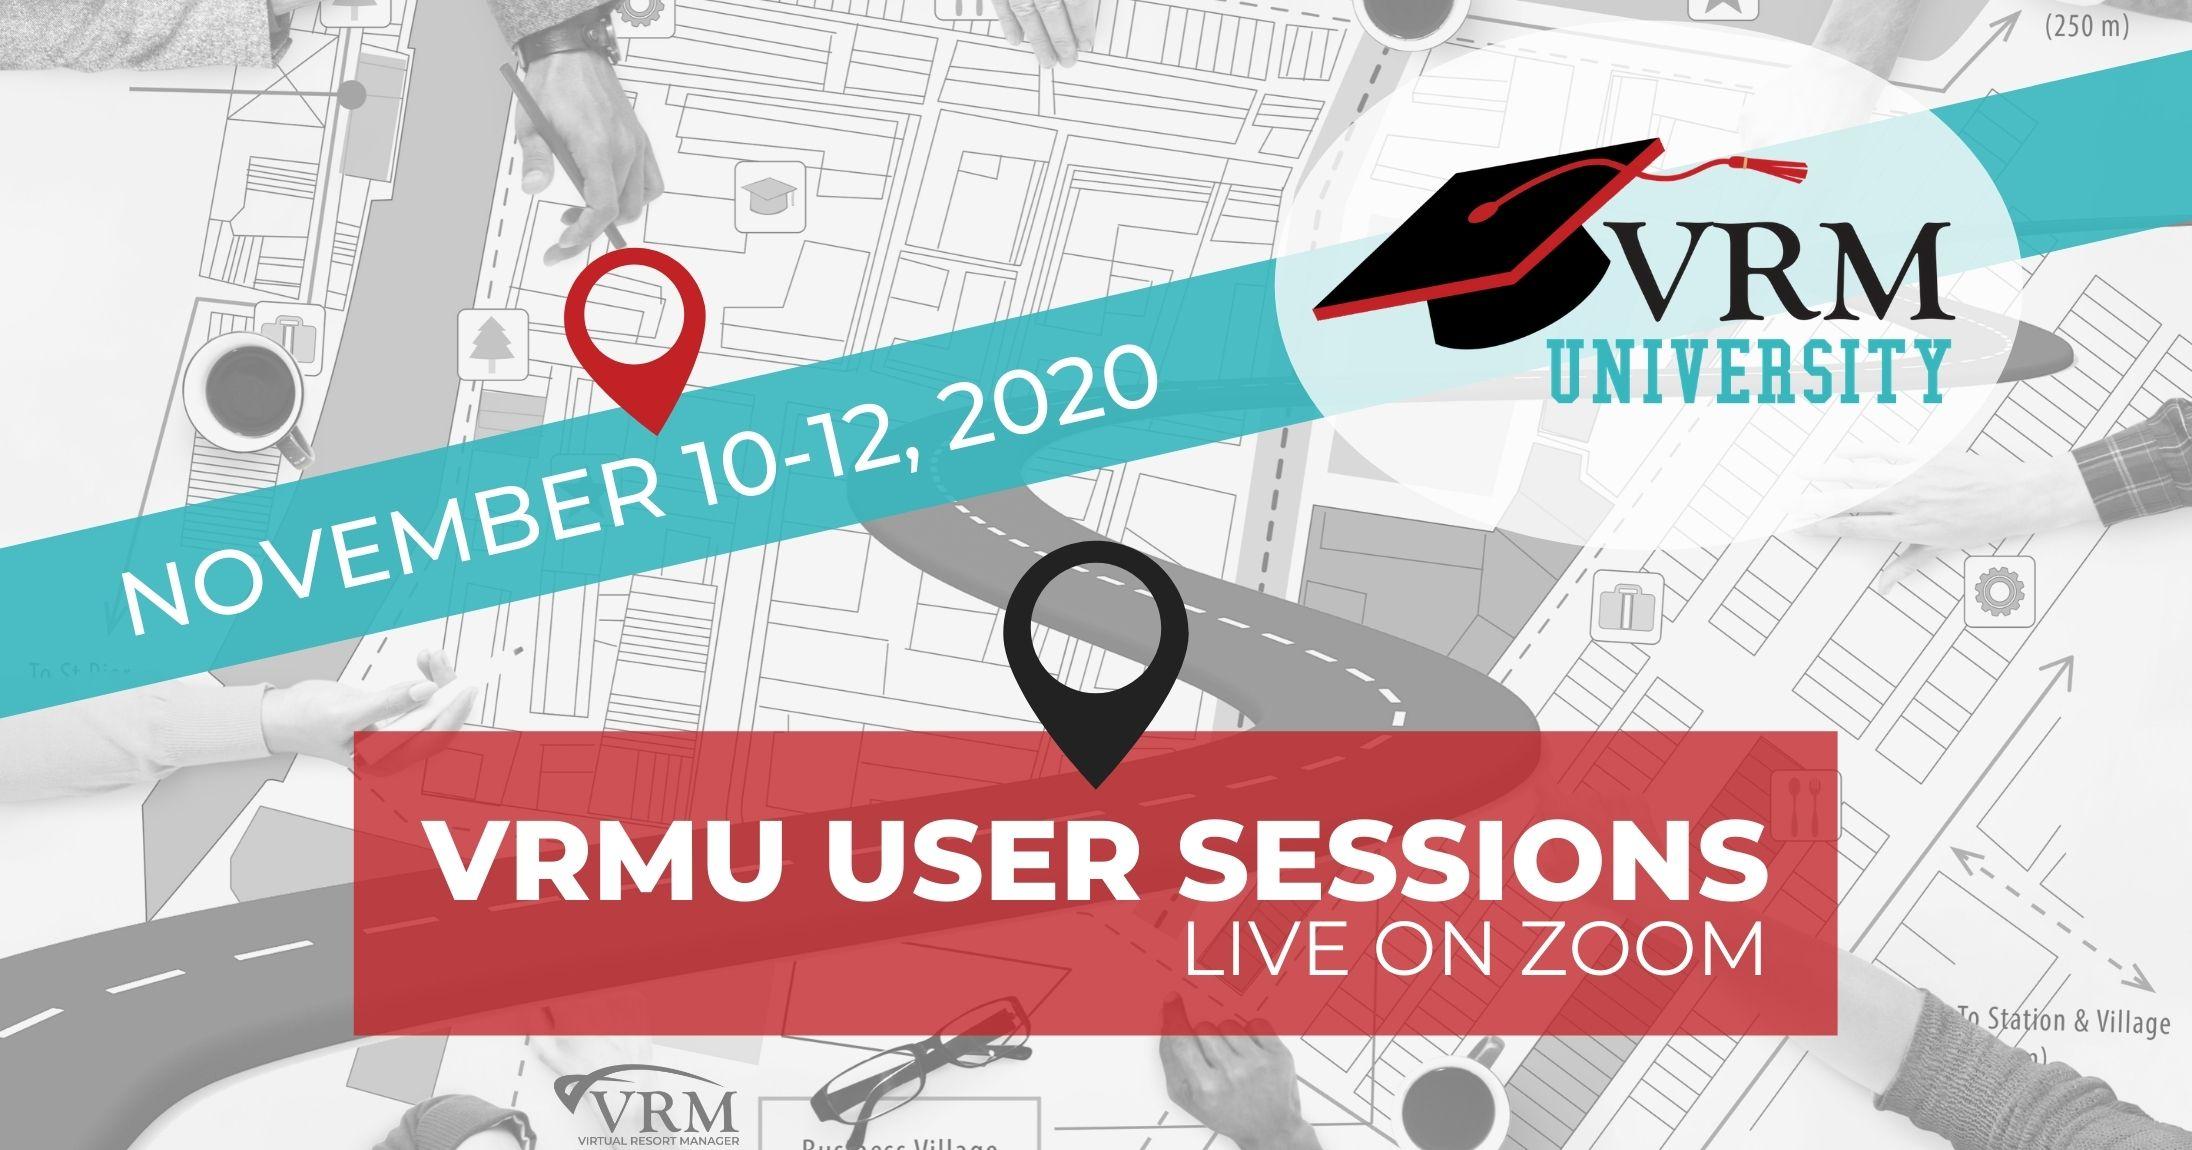 VRMU User Session 2020